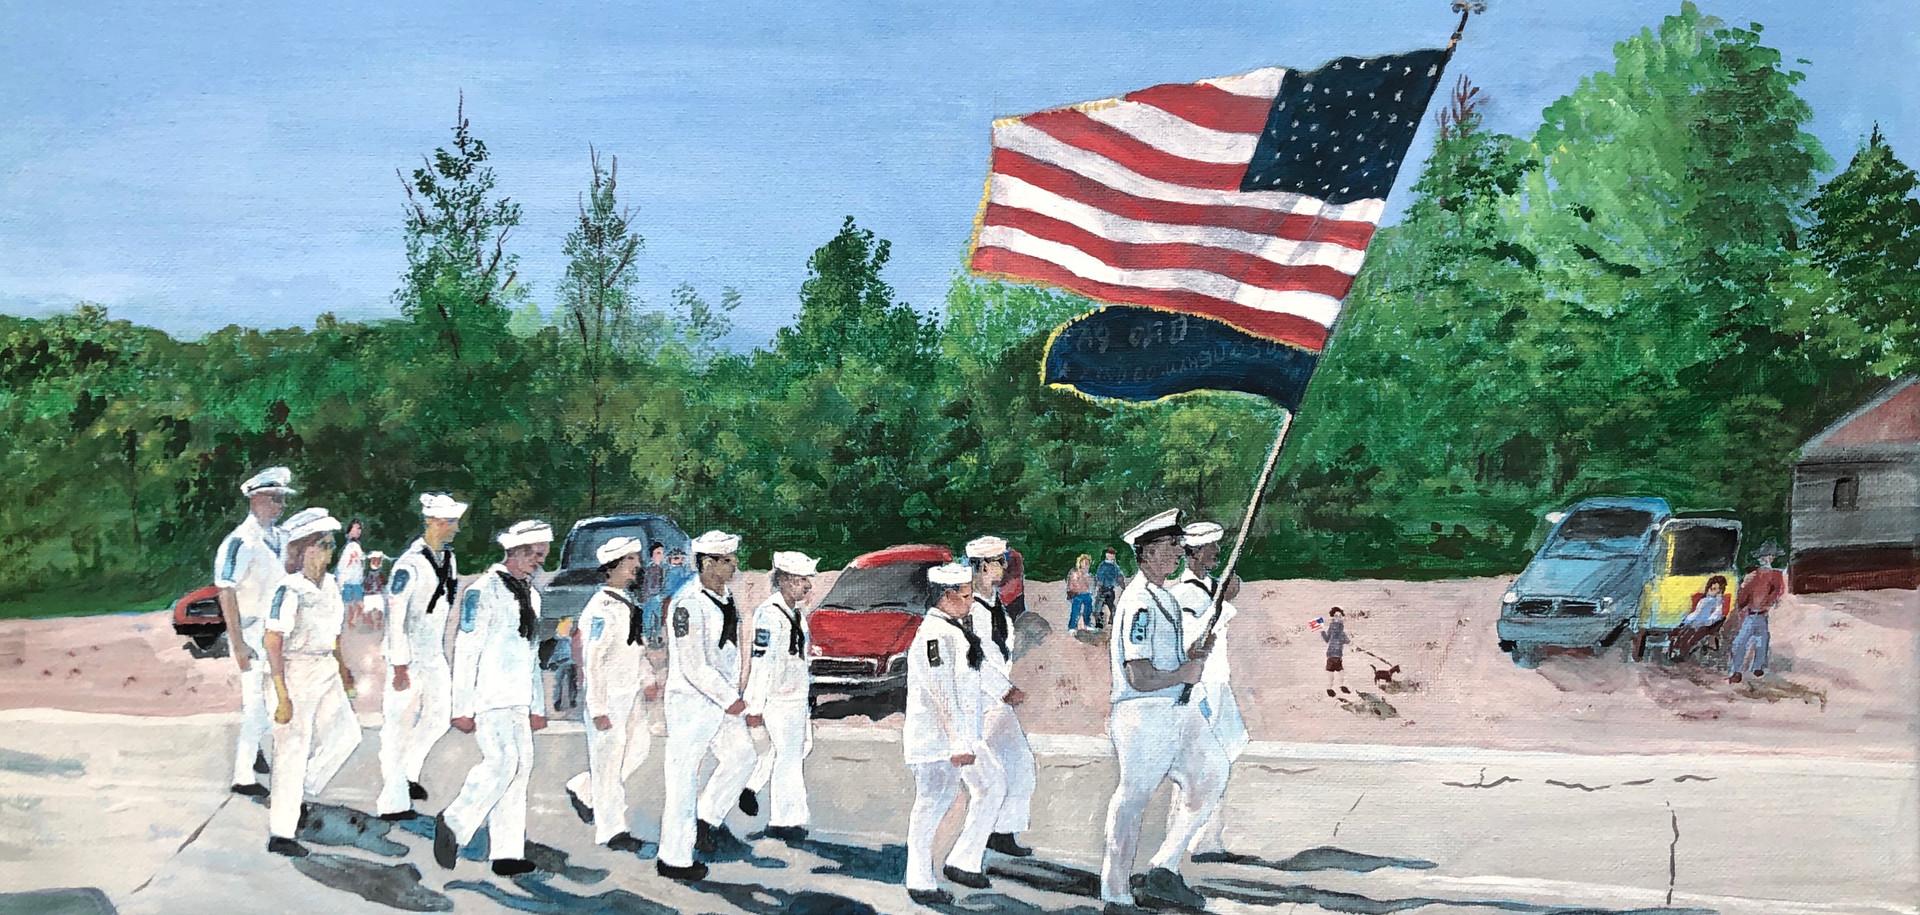 854 - Sailors on Parade .jpg